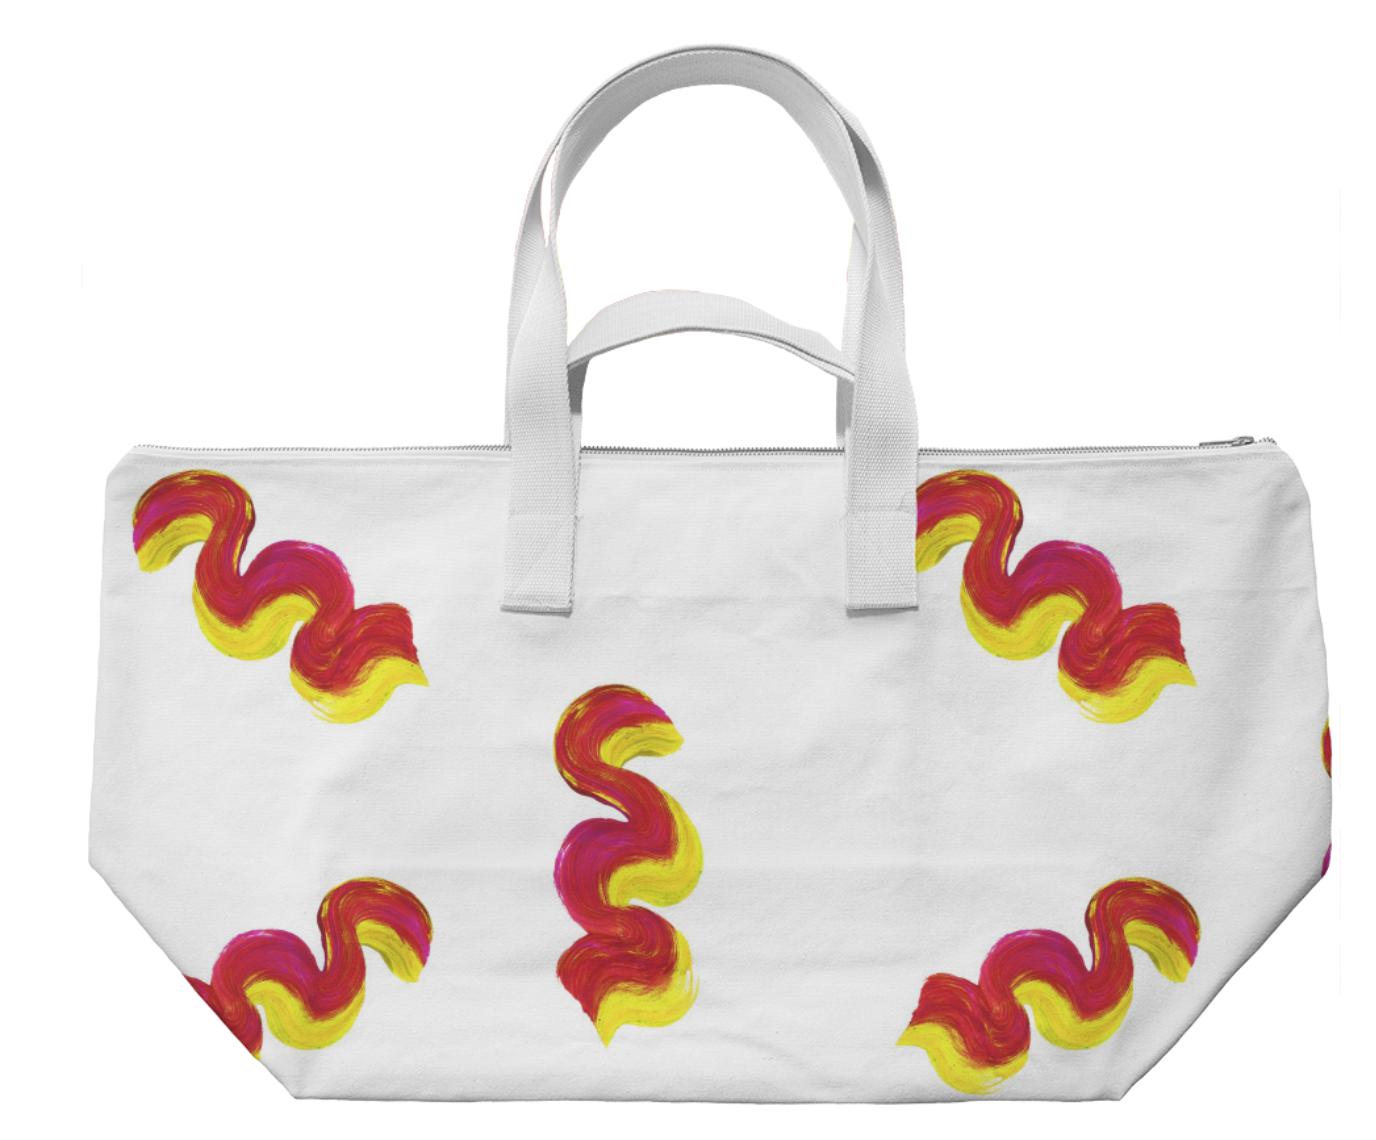 WAVY WEEKENDER III    Cotton Canvas Bag      Seventy Five Dollars